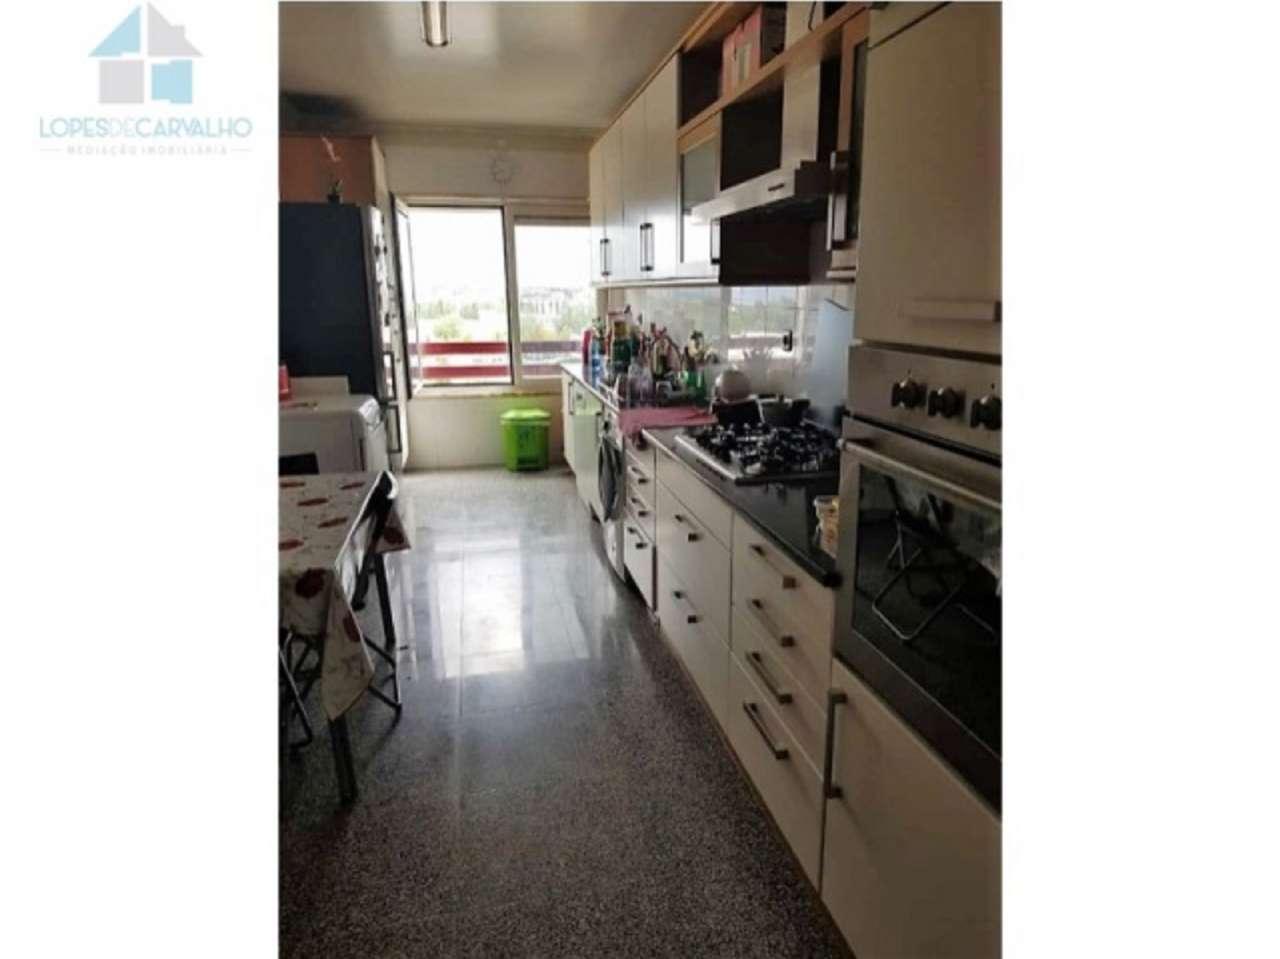 Apartamento para comprar, Carnide, Lisboa - Foto 3